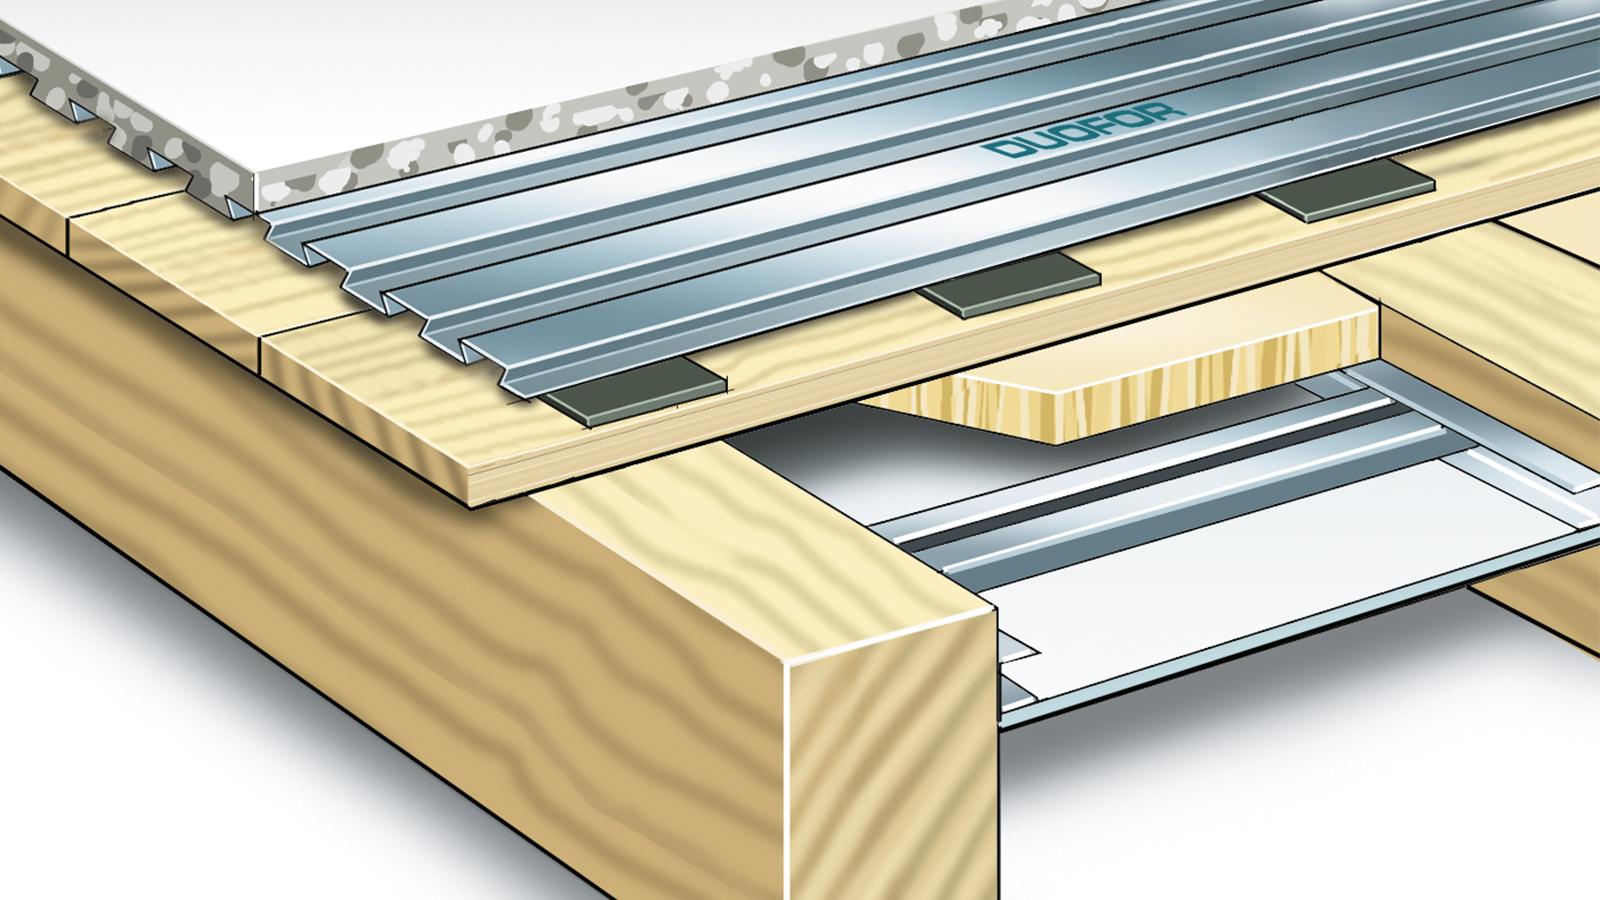 Sound-absorbing floors